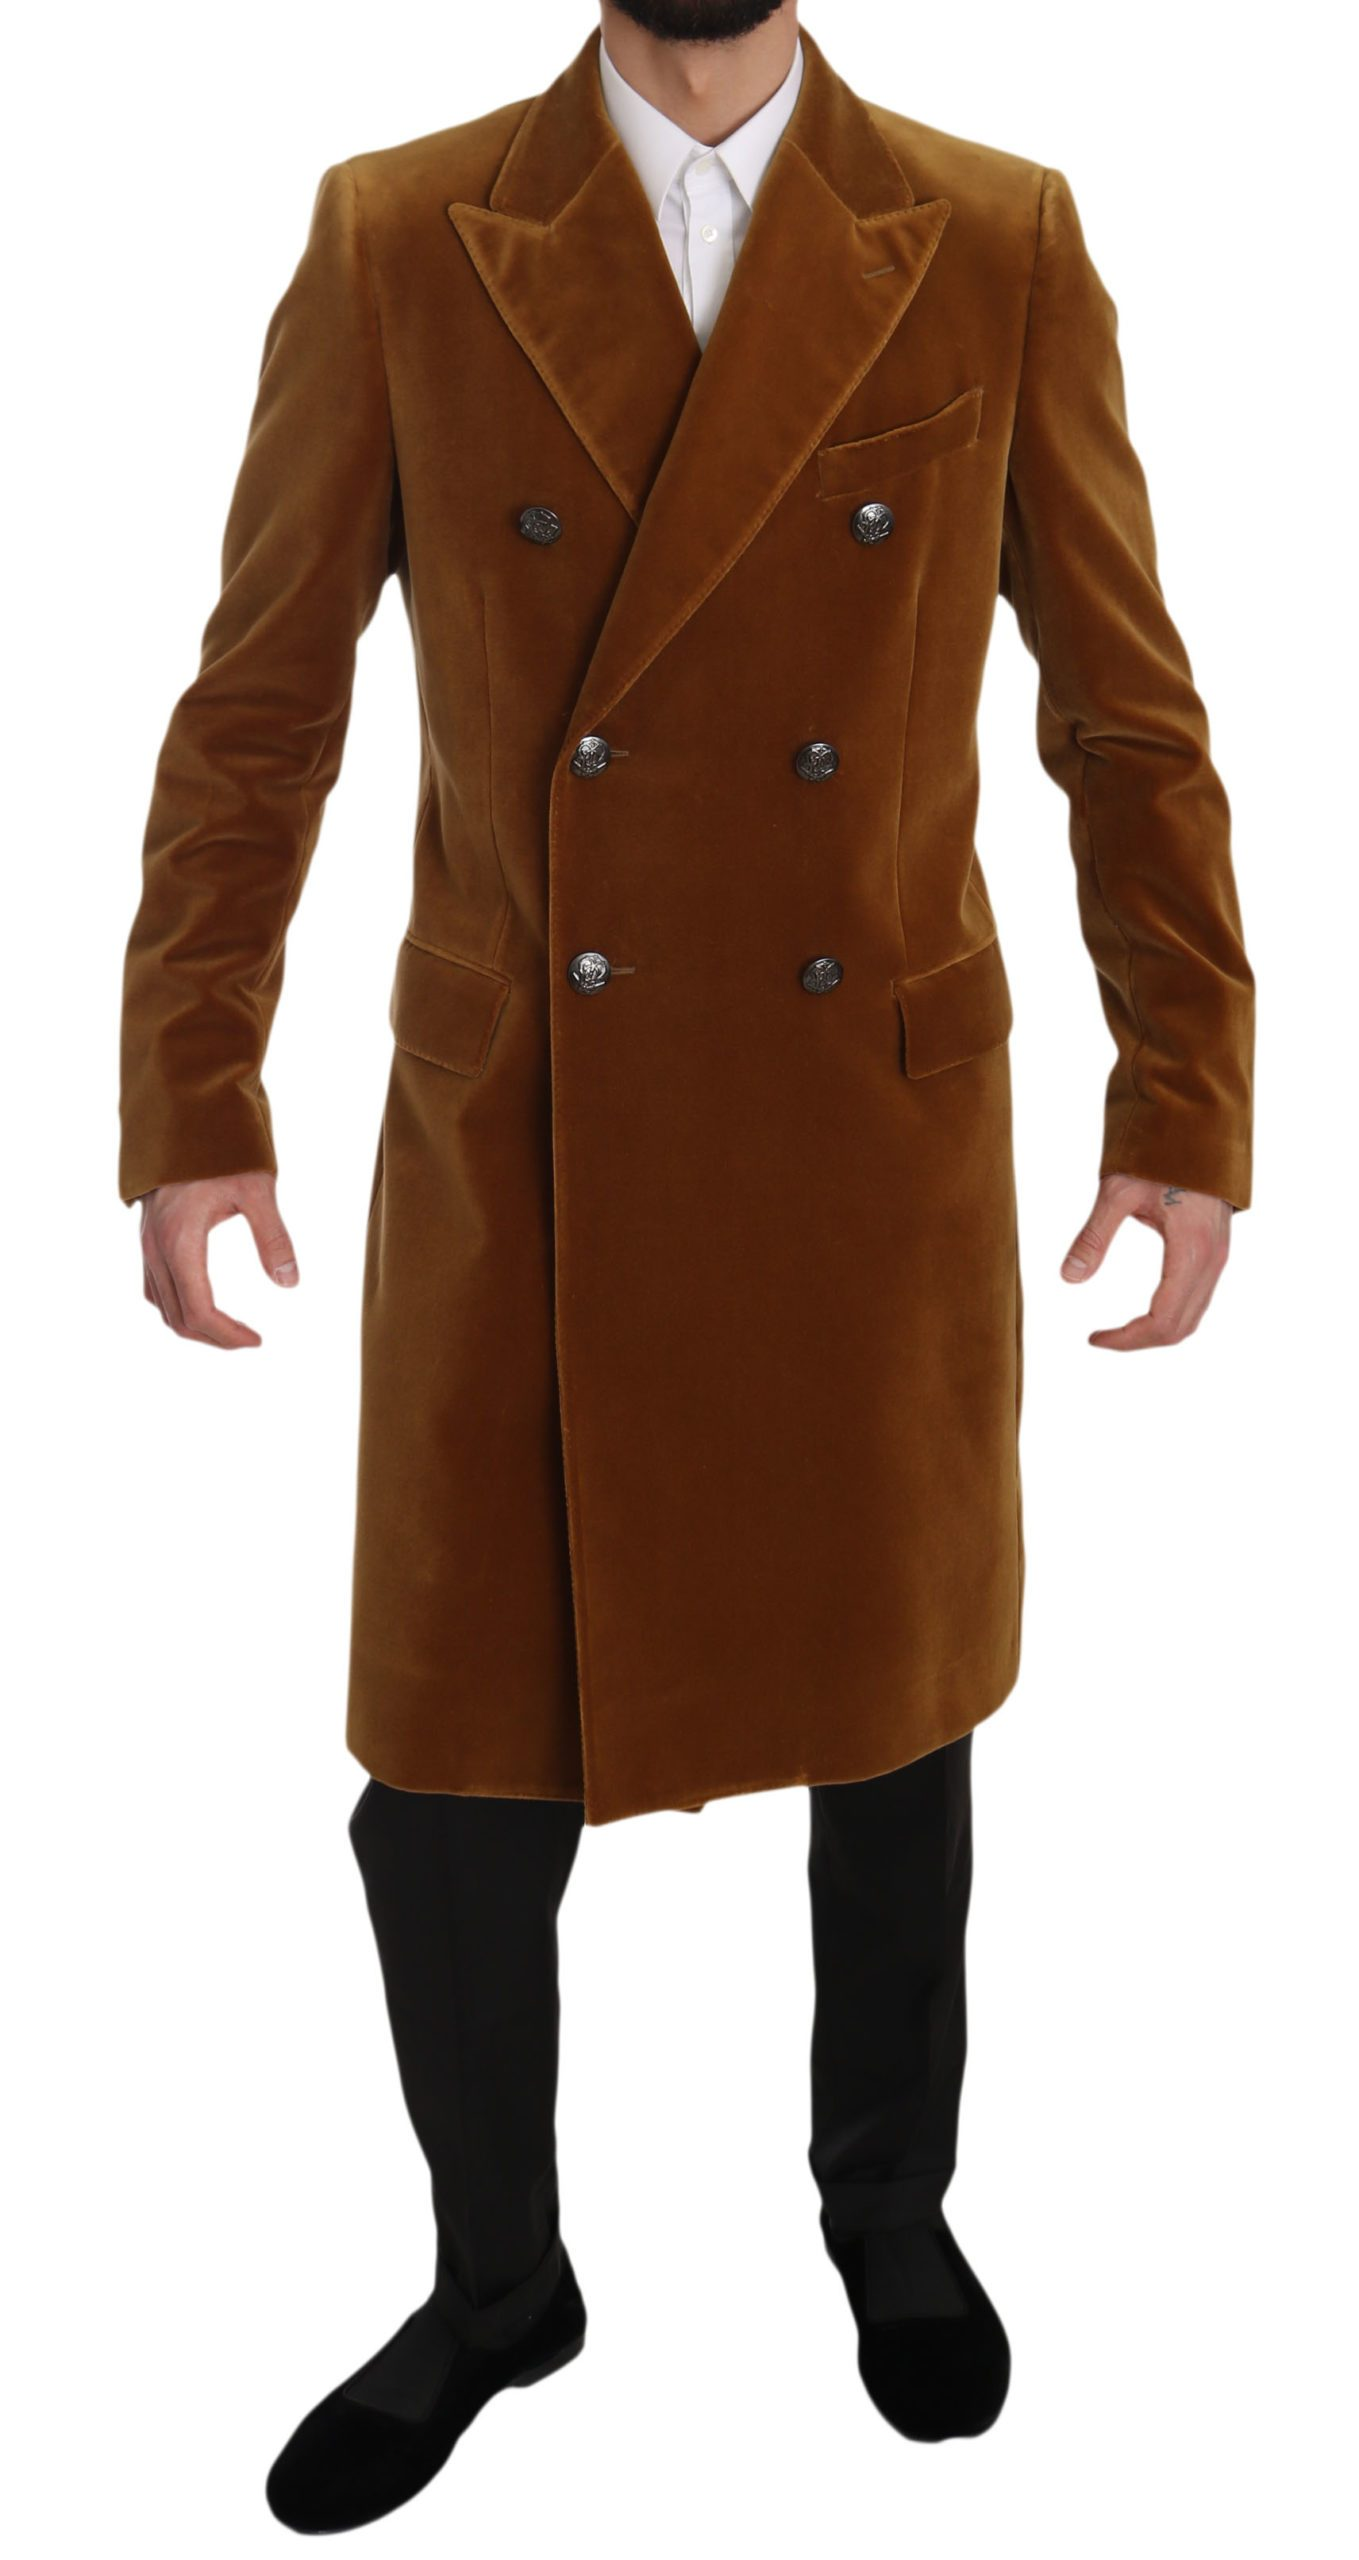 Dolce & Gabbana Men's Jacket Yellow JKT2389 - IT48 | M